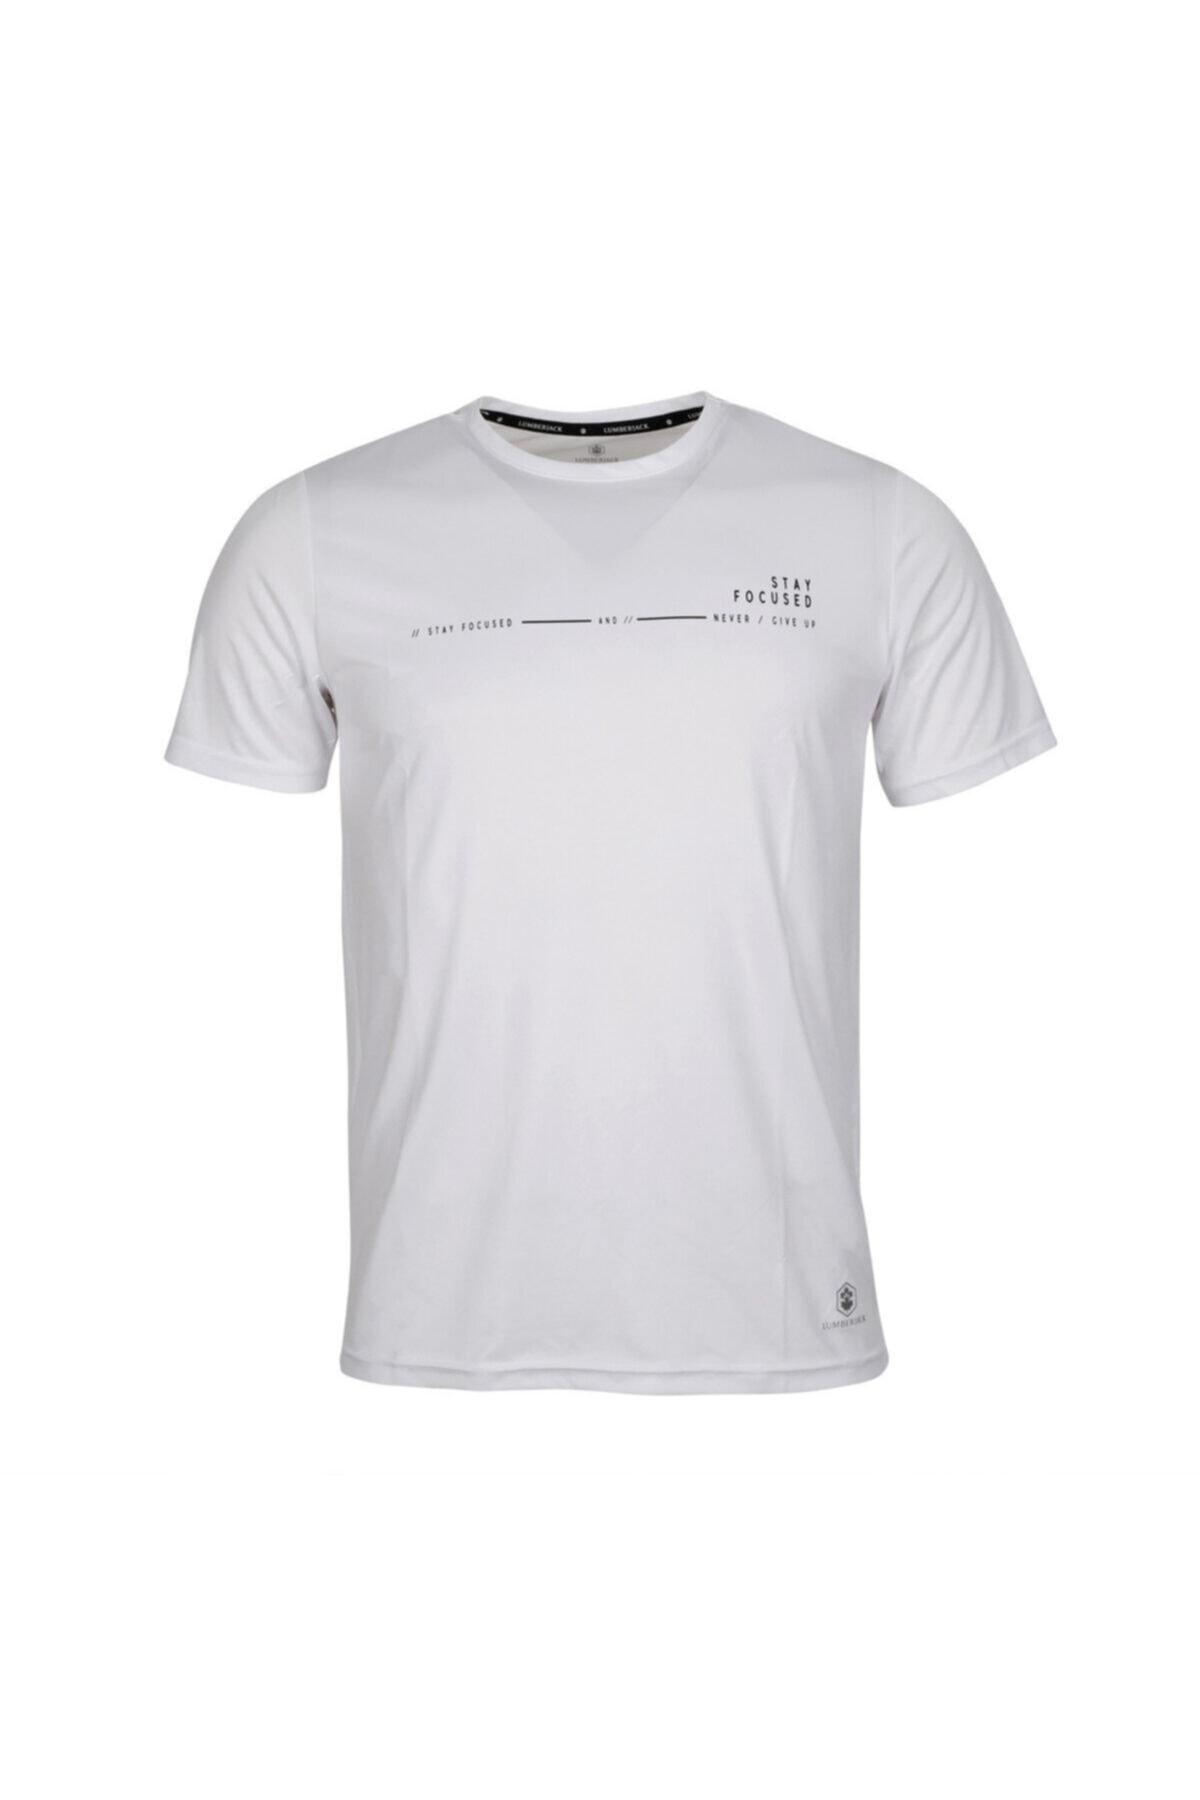 CT384 ARMY MINIMAL T-SHIR Beyaz Erkek T-Shirt 100582722